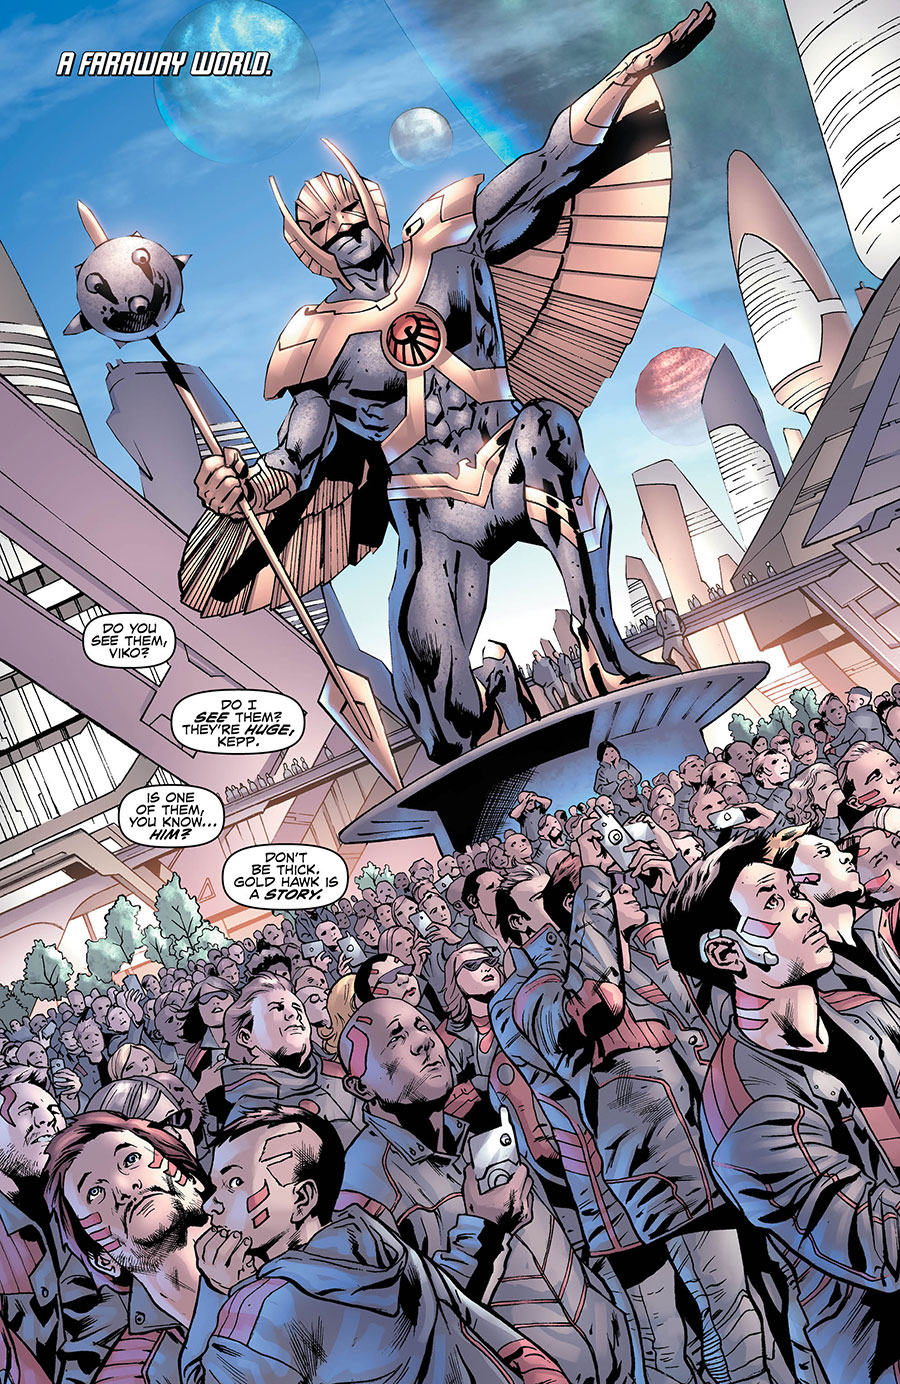 Hawkman 4_1 - DC Comics News